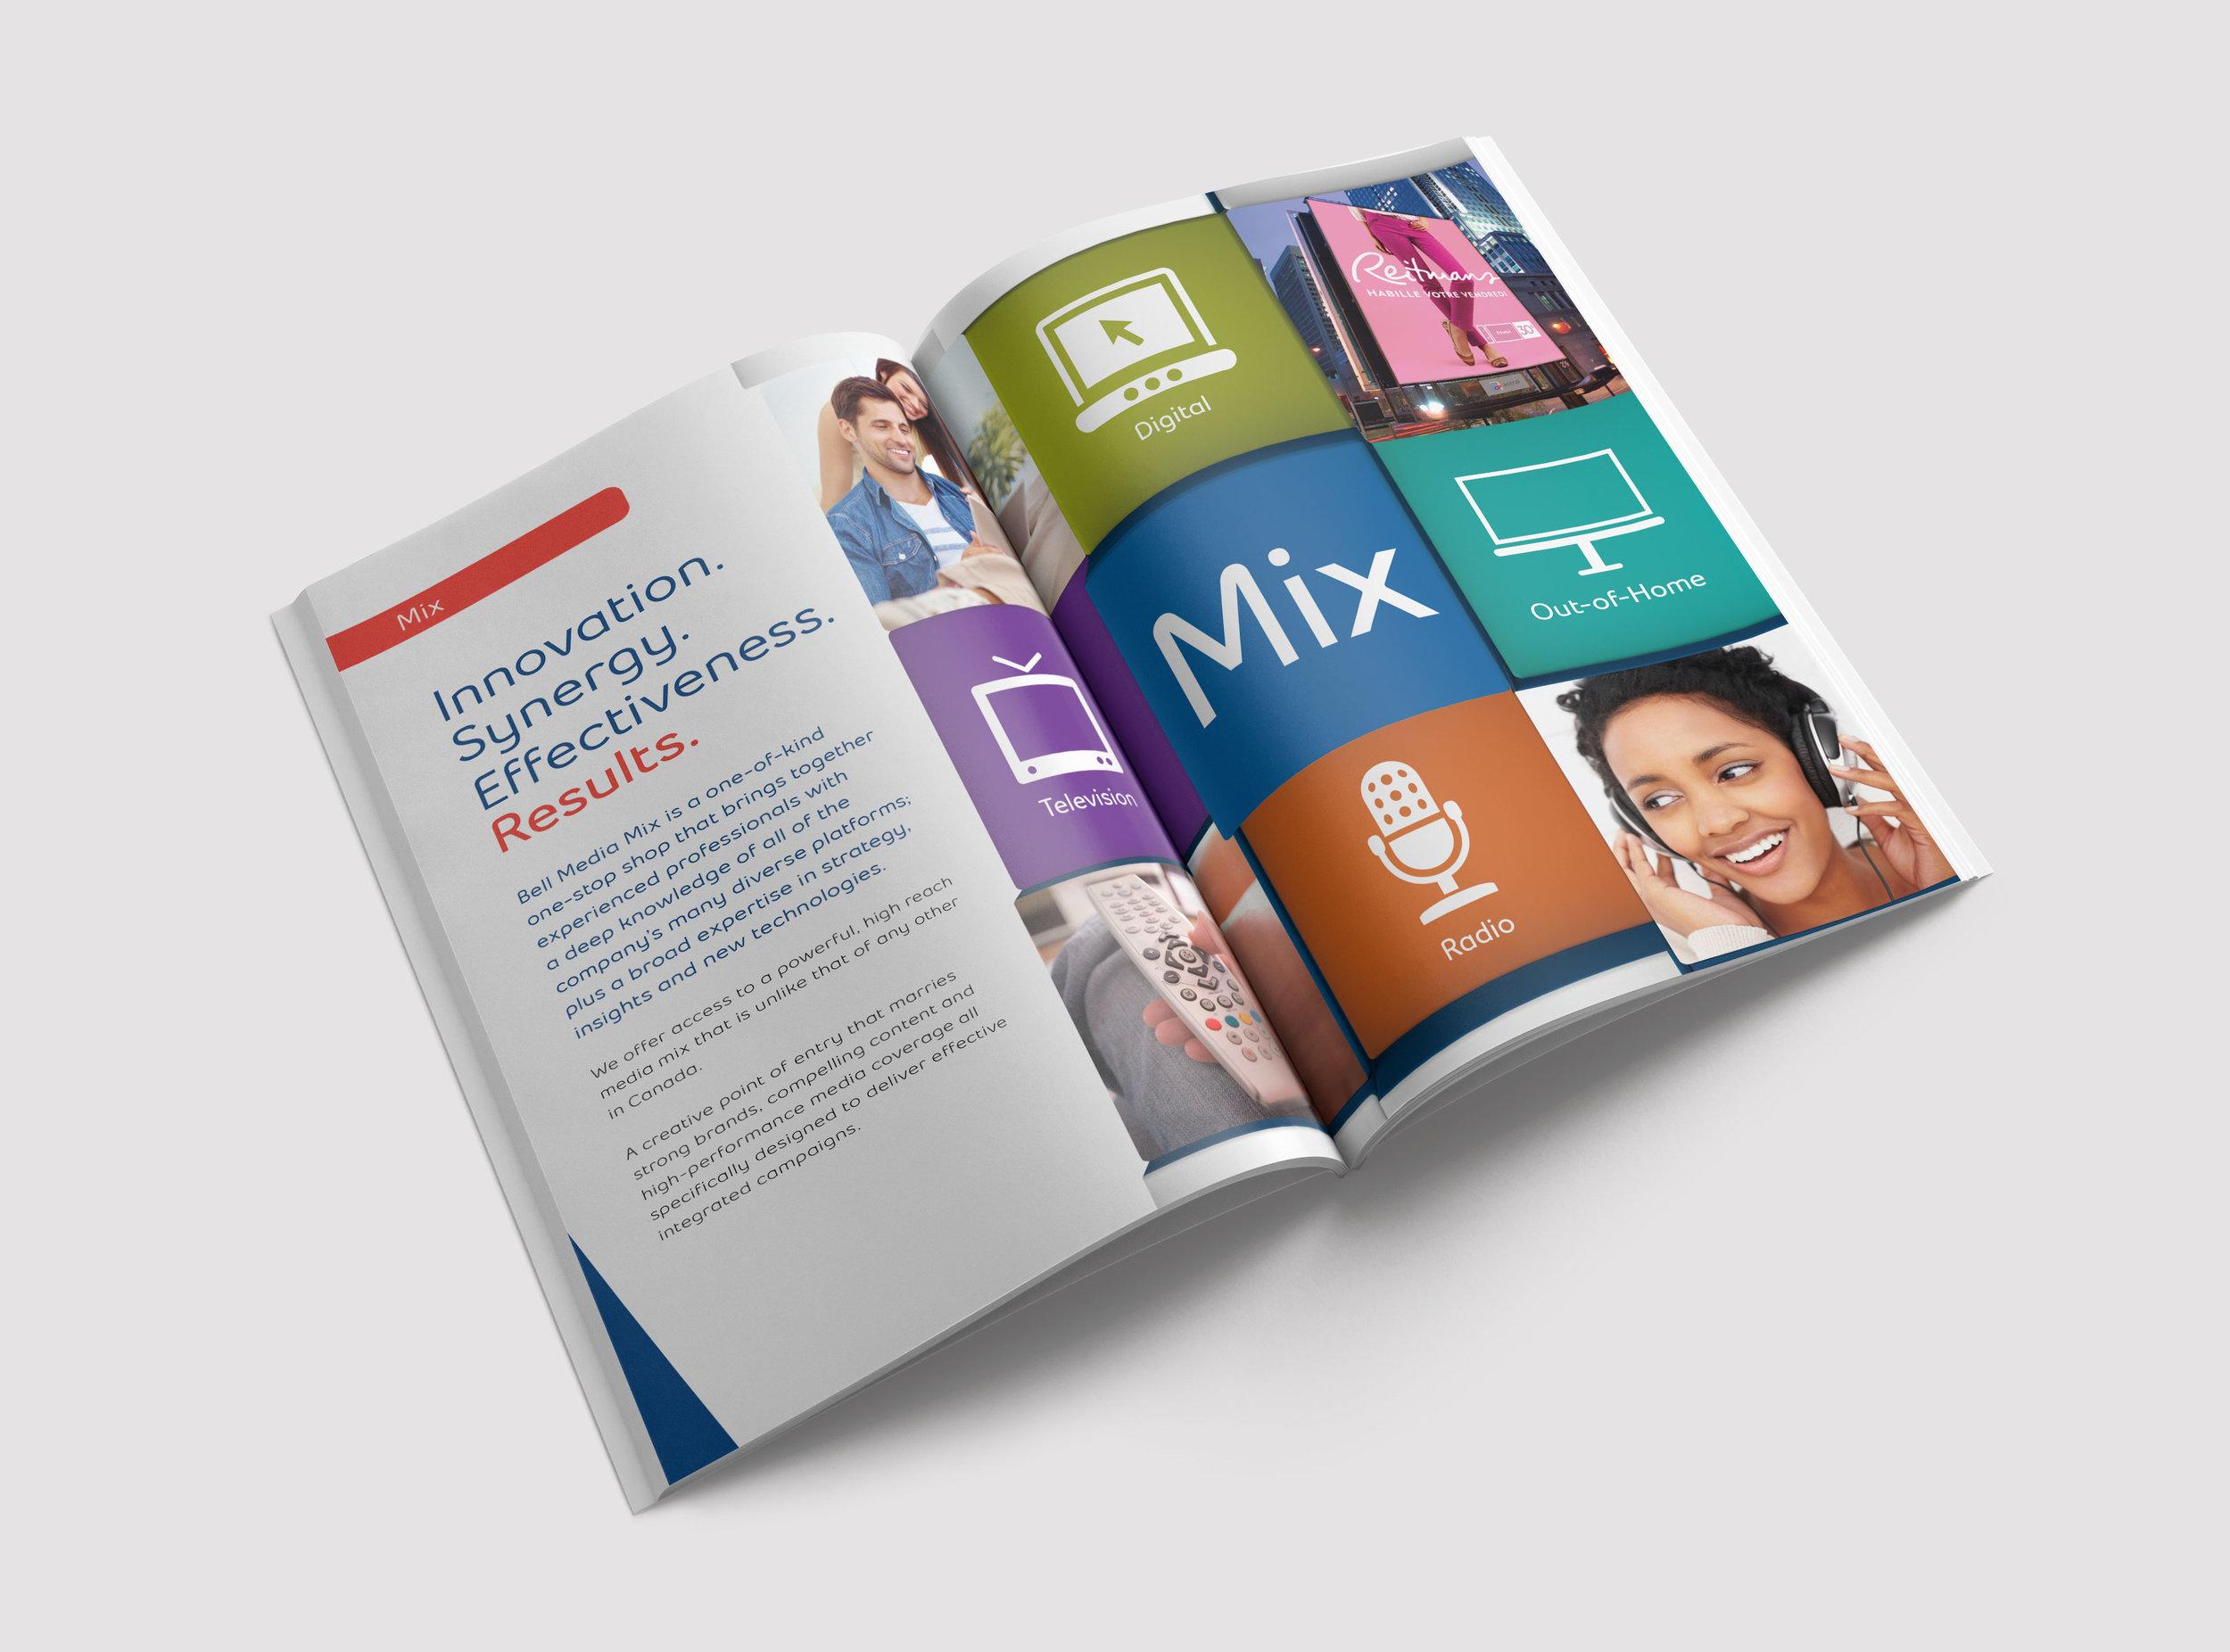 BellMediaSales_Book6b.jpg